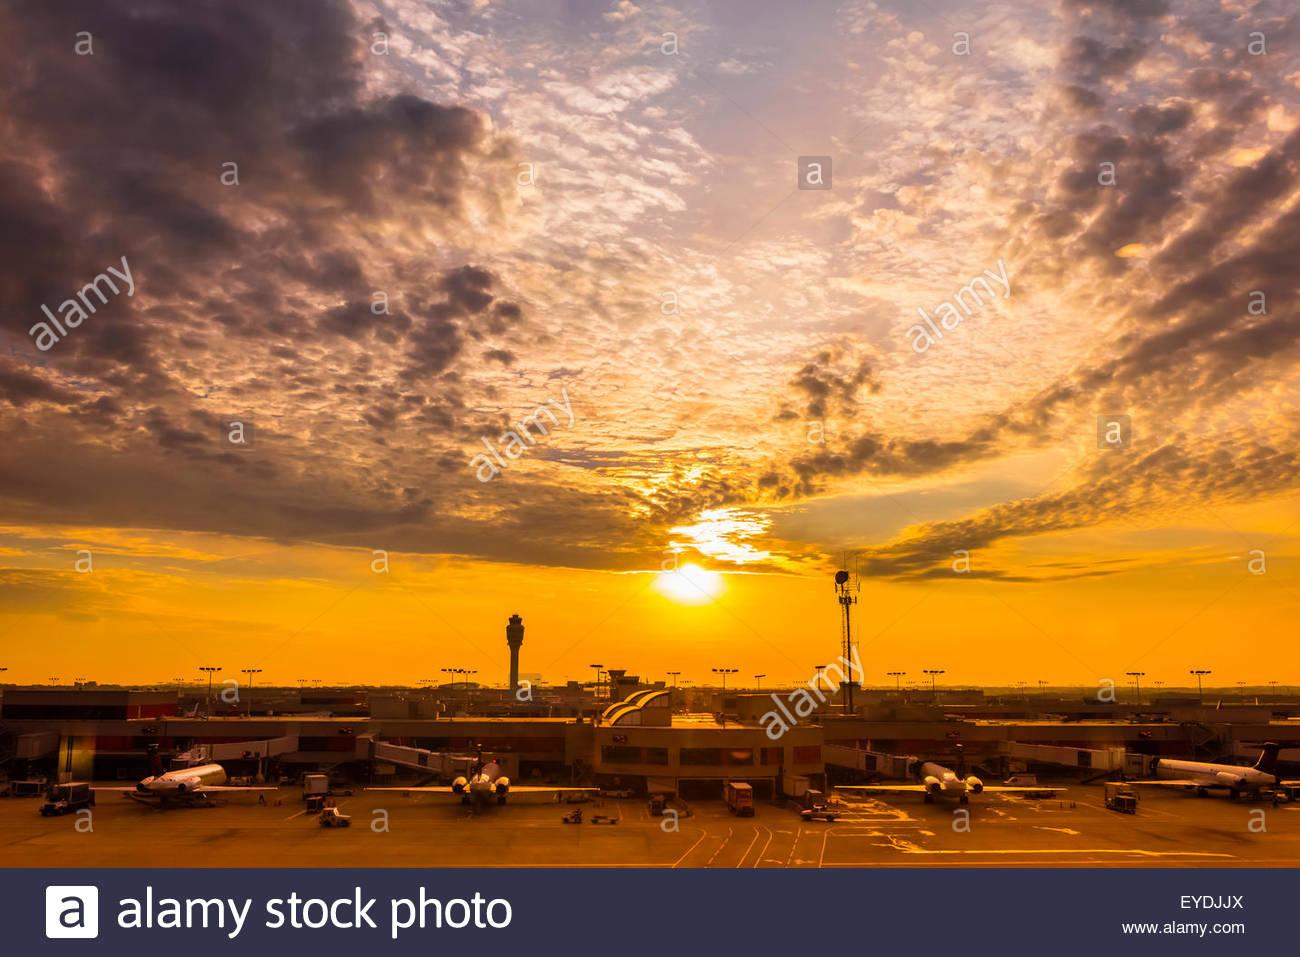 Sunrise, Hartsfield-Jackson Atlanta International Airport, Atlanta, Georgia USA. - Stock Image